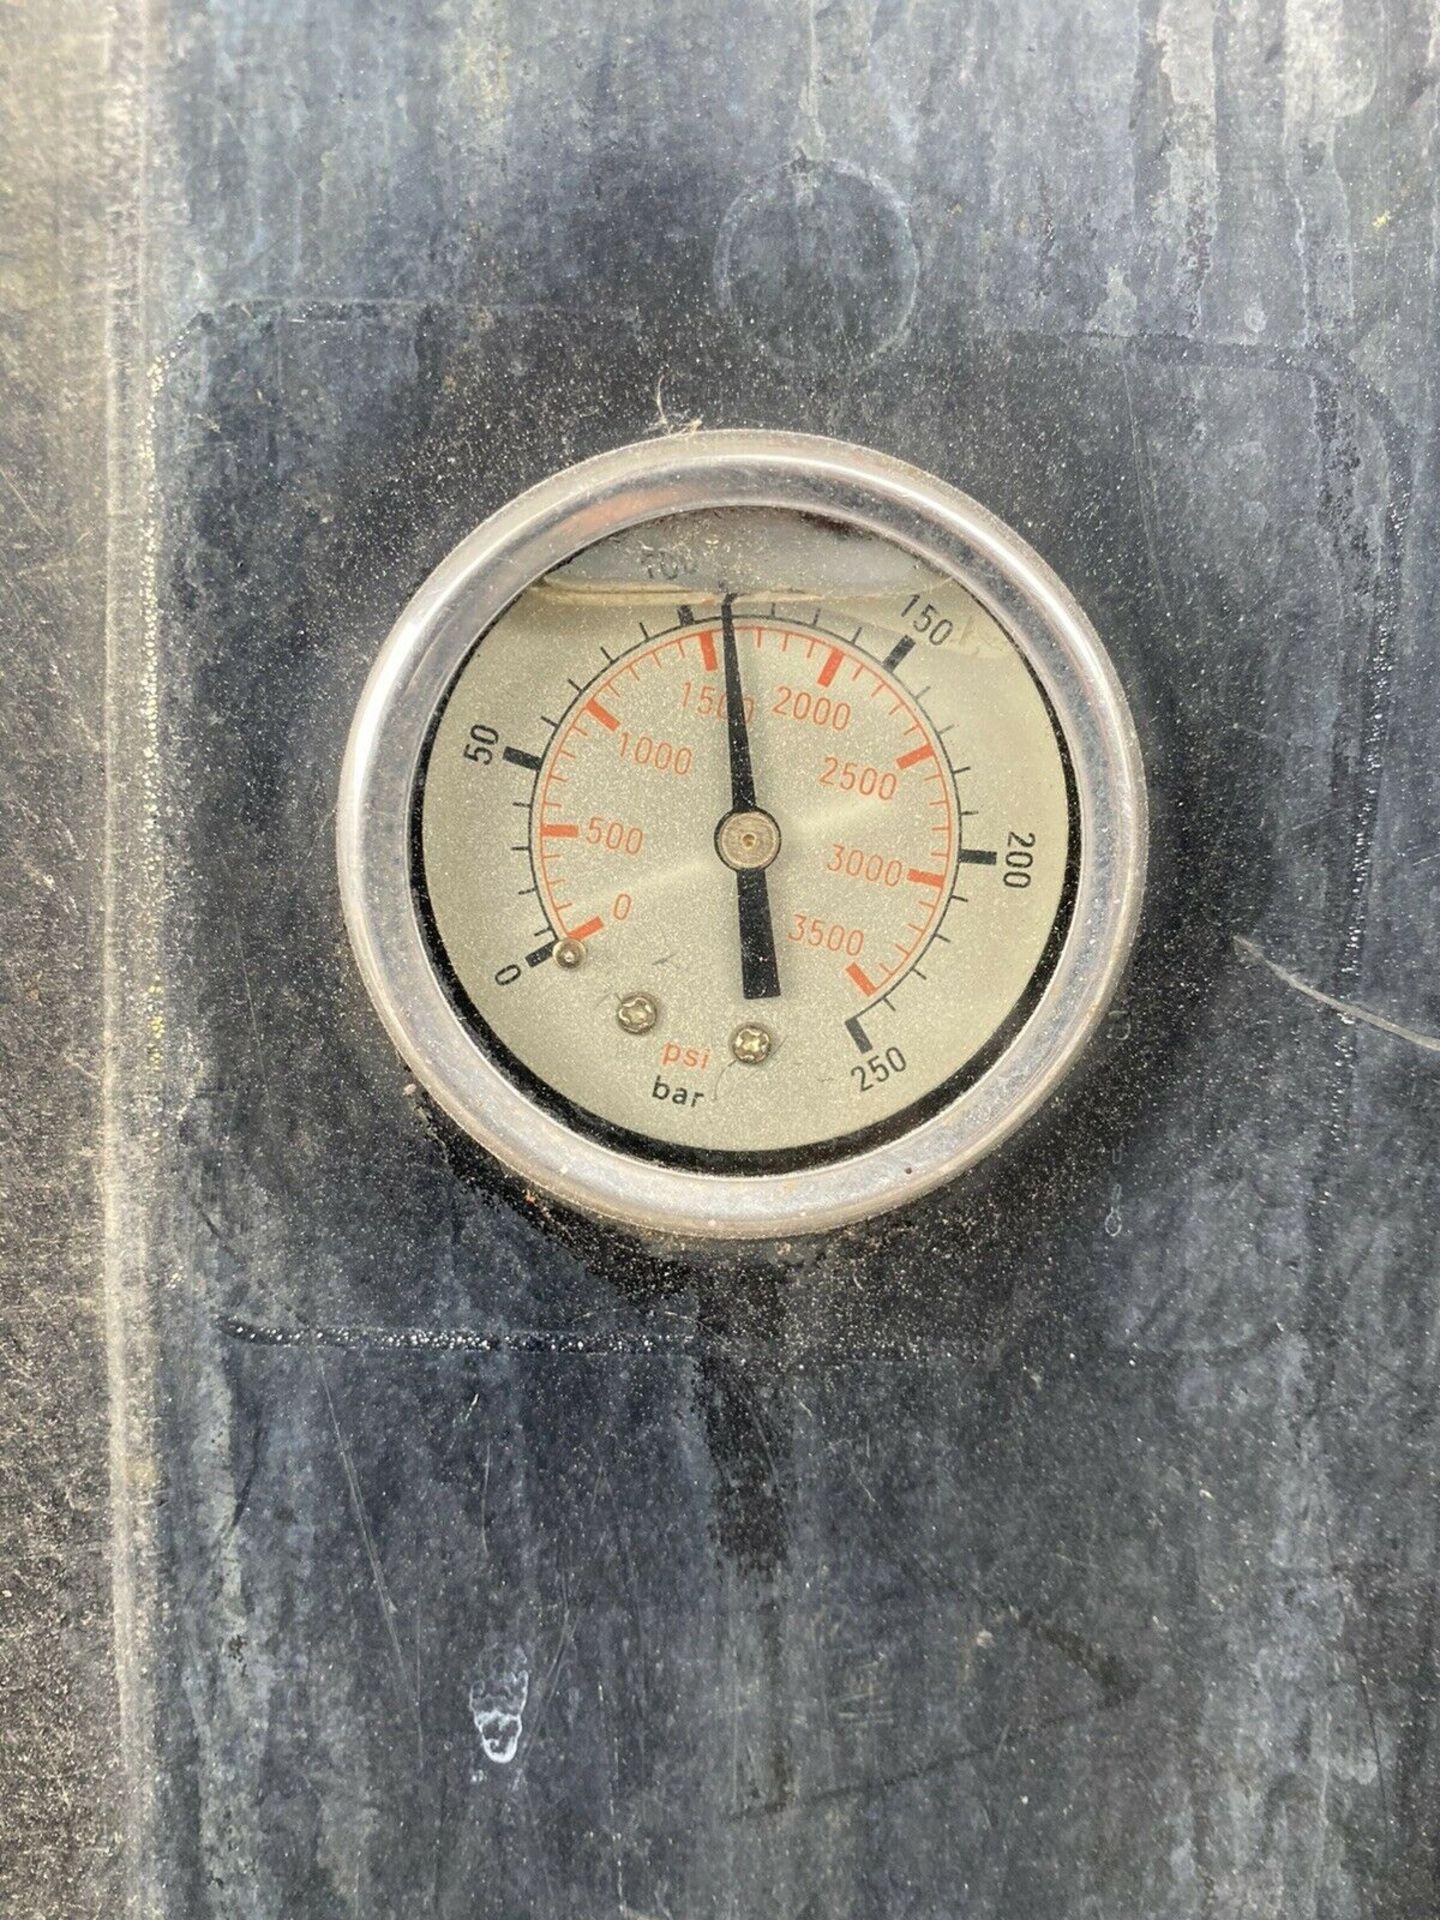 EHRLE HD623 STANDARD HOT WATER PRESSURE WASHER *NO VAT* - Image 4 of 6